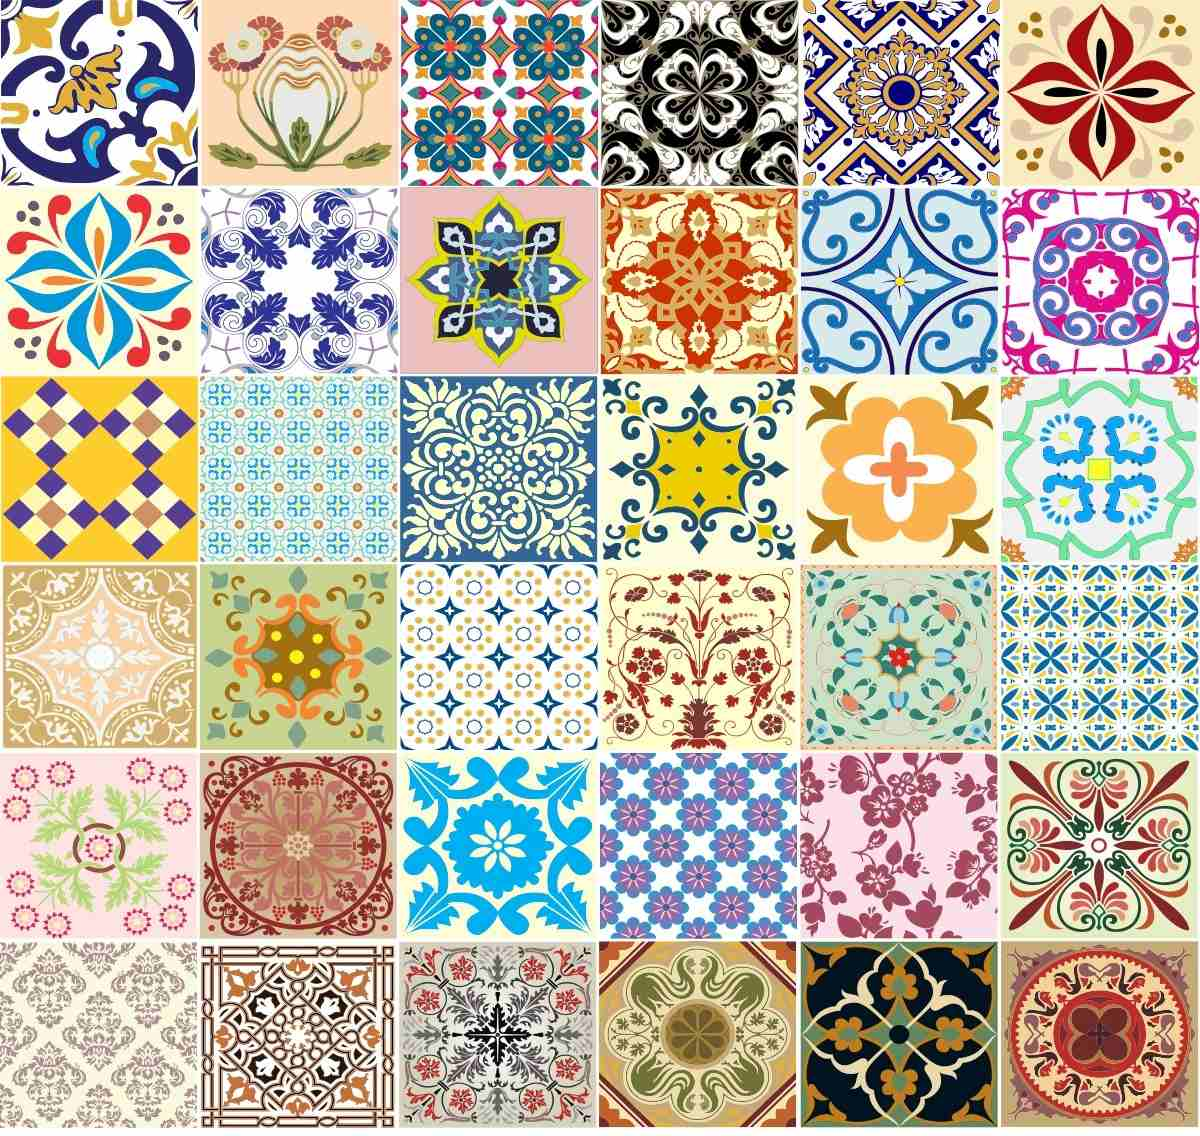 adesivo azulejos decorativos 36 unidades frete gr tis